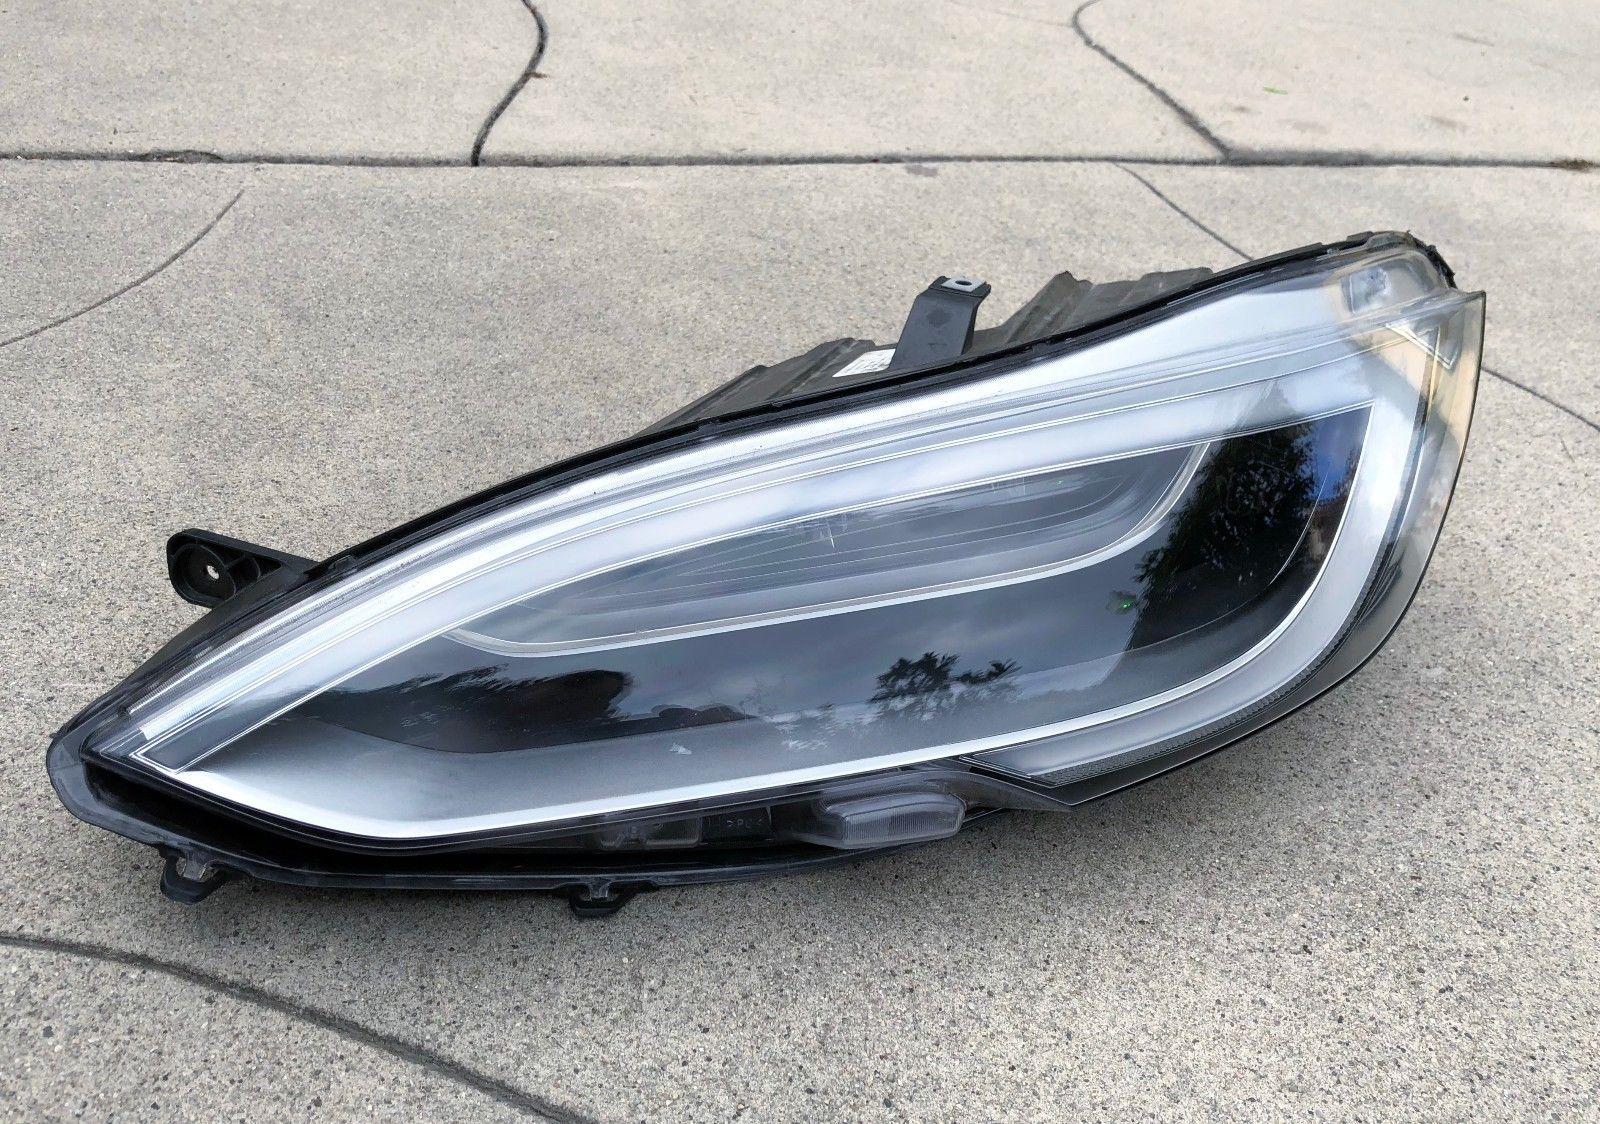 Original-OEM-16-17-Tesla-Model-S-LED-Headlight-Complete-w-Ballast-Module-LH-112702673691.jpeg